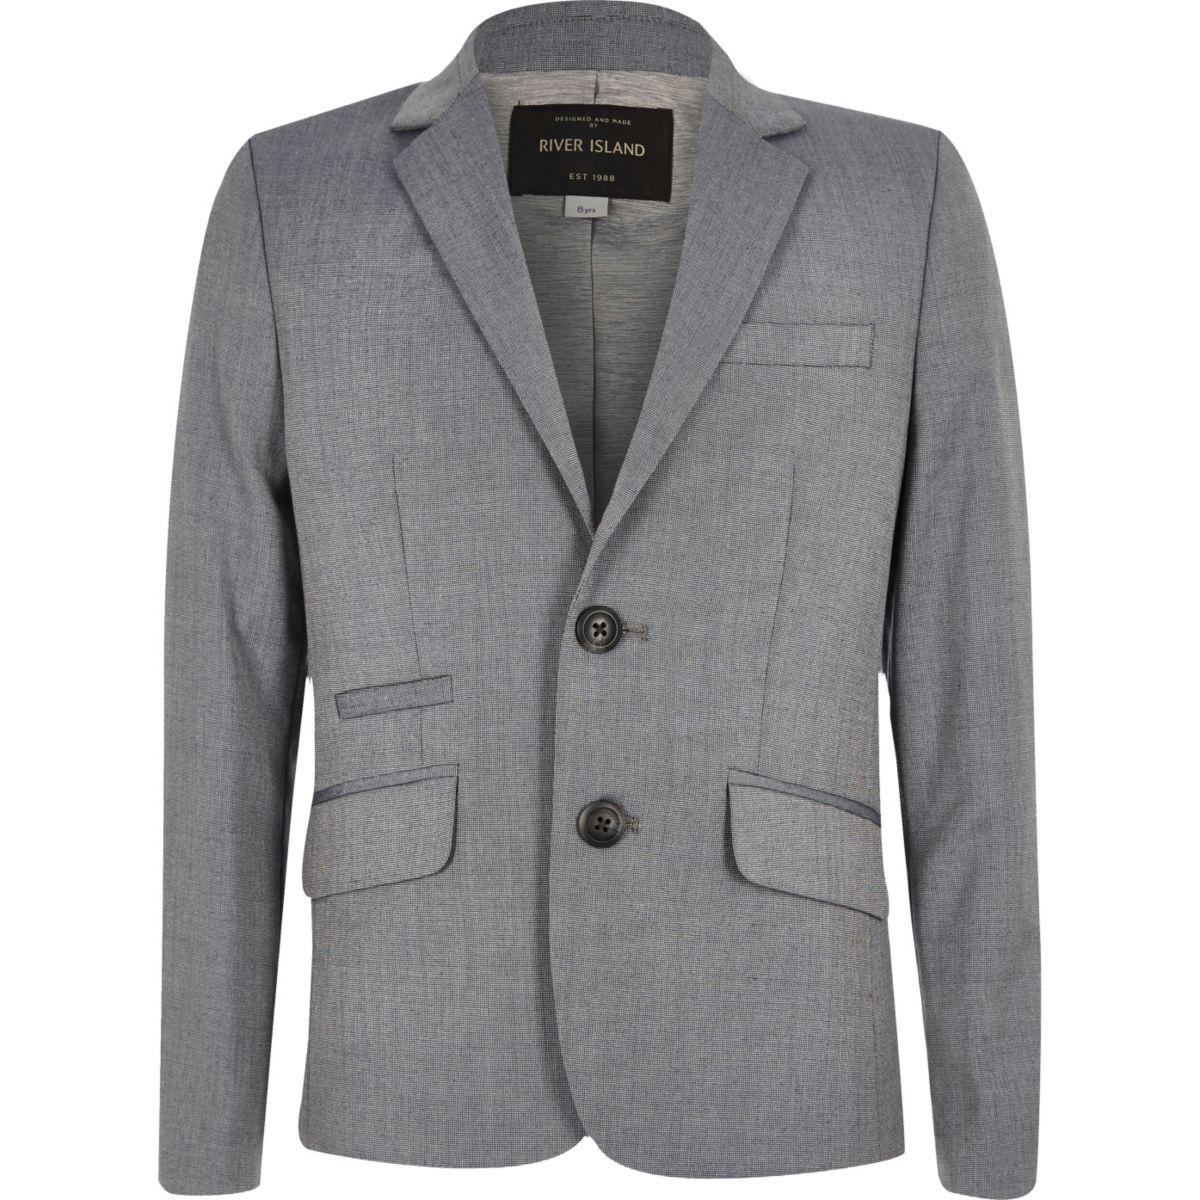 veste de costume cintr e gris clair pour gar on tenues habill es promos gar on. Black Bedroom Furniture Sets. Home Design Ideas